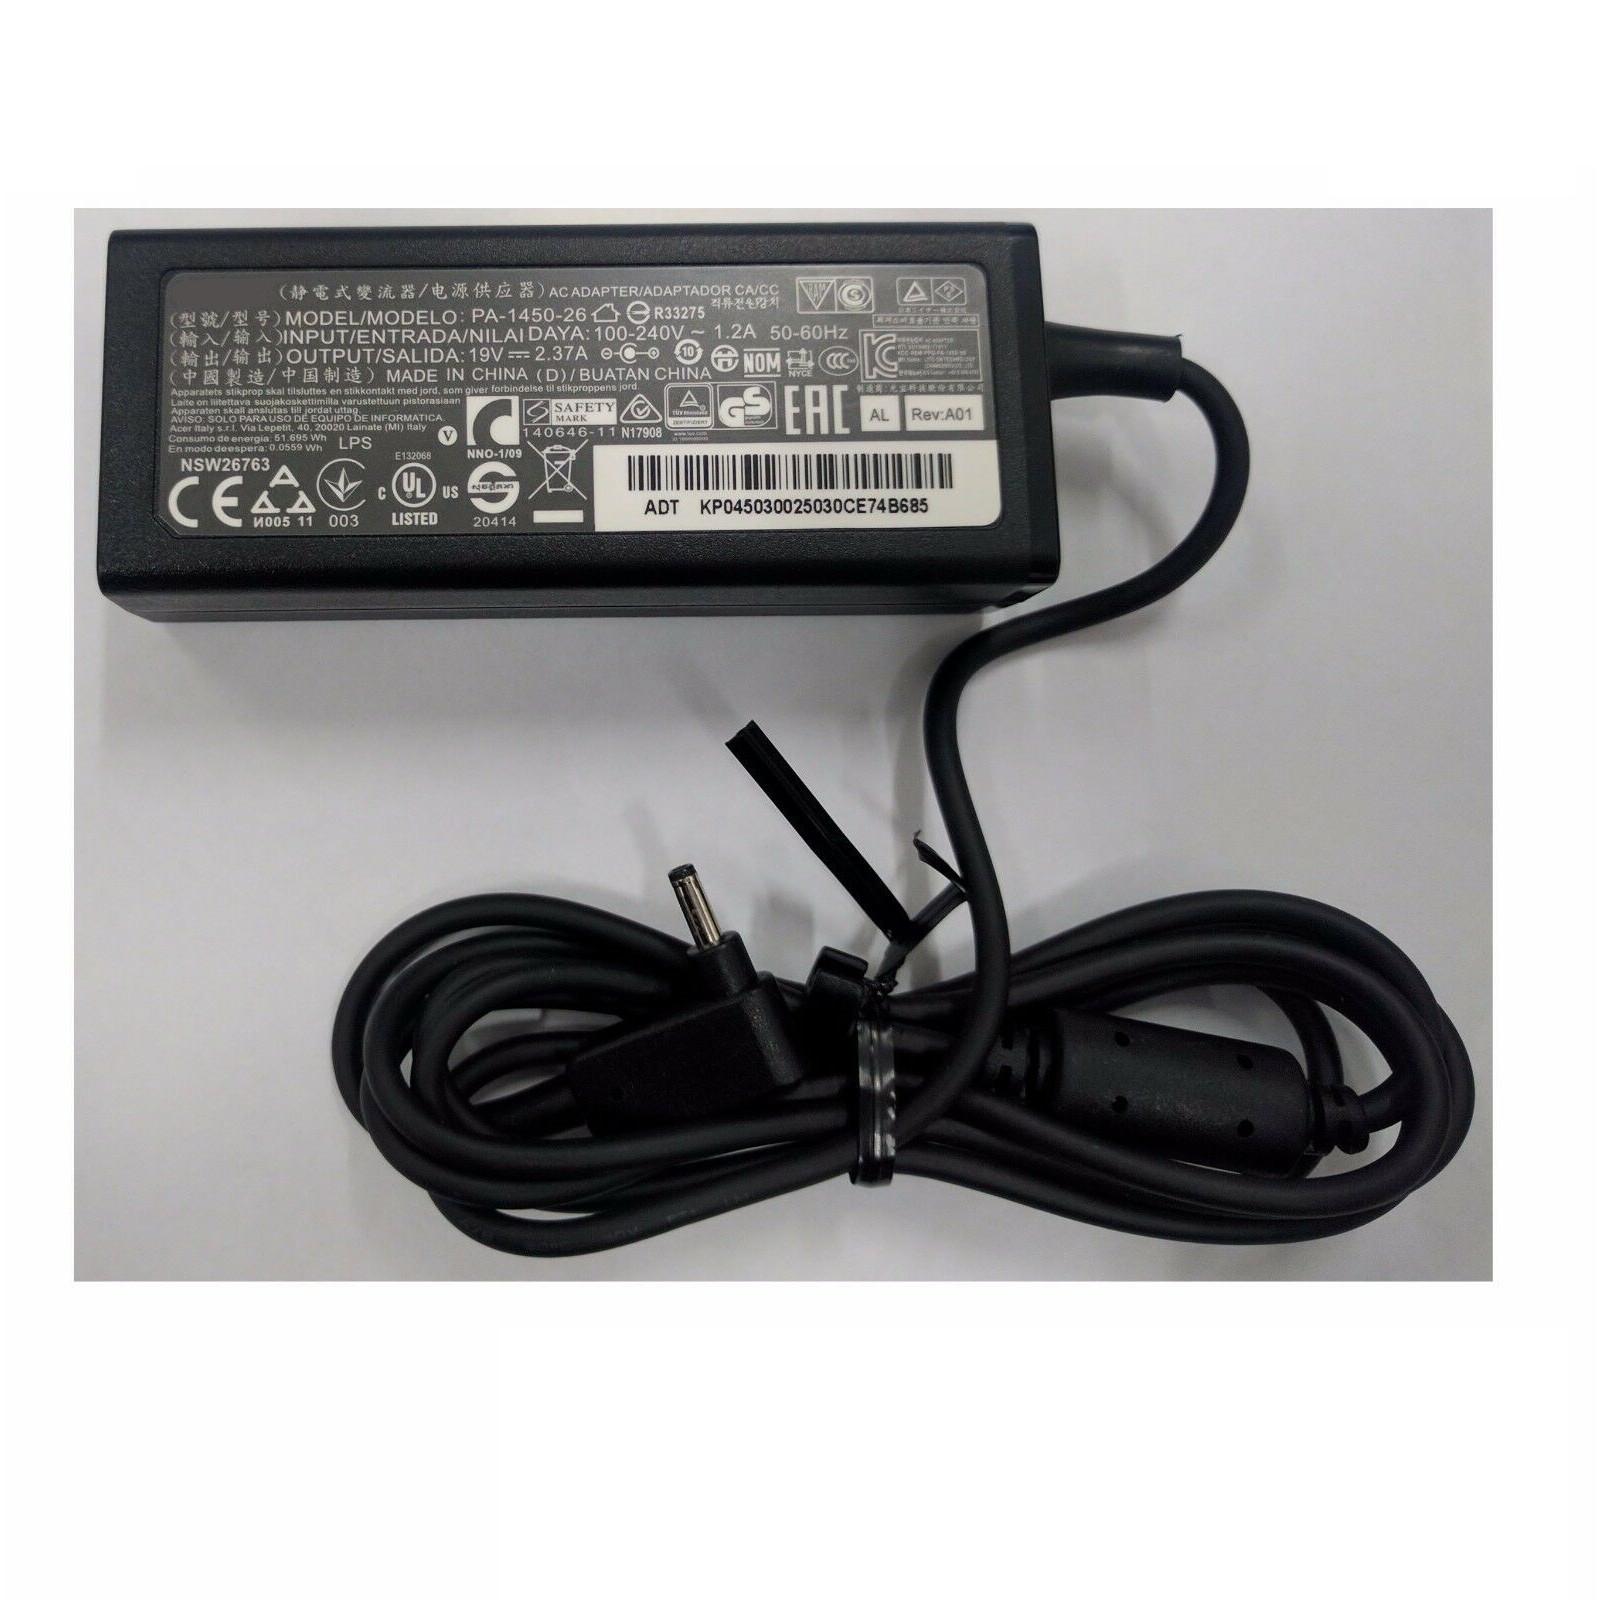 Sạc dành cho Laptop ACER Aspire V3-331 | Adapter ACER V3-371